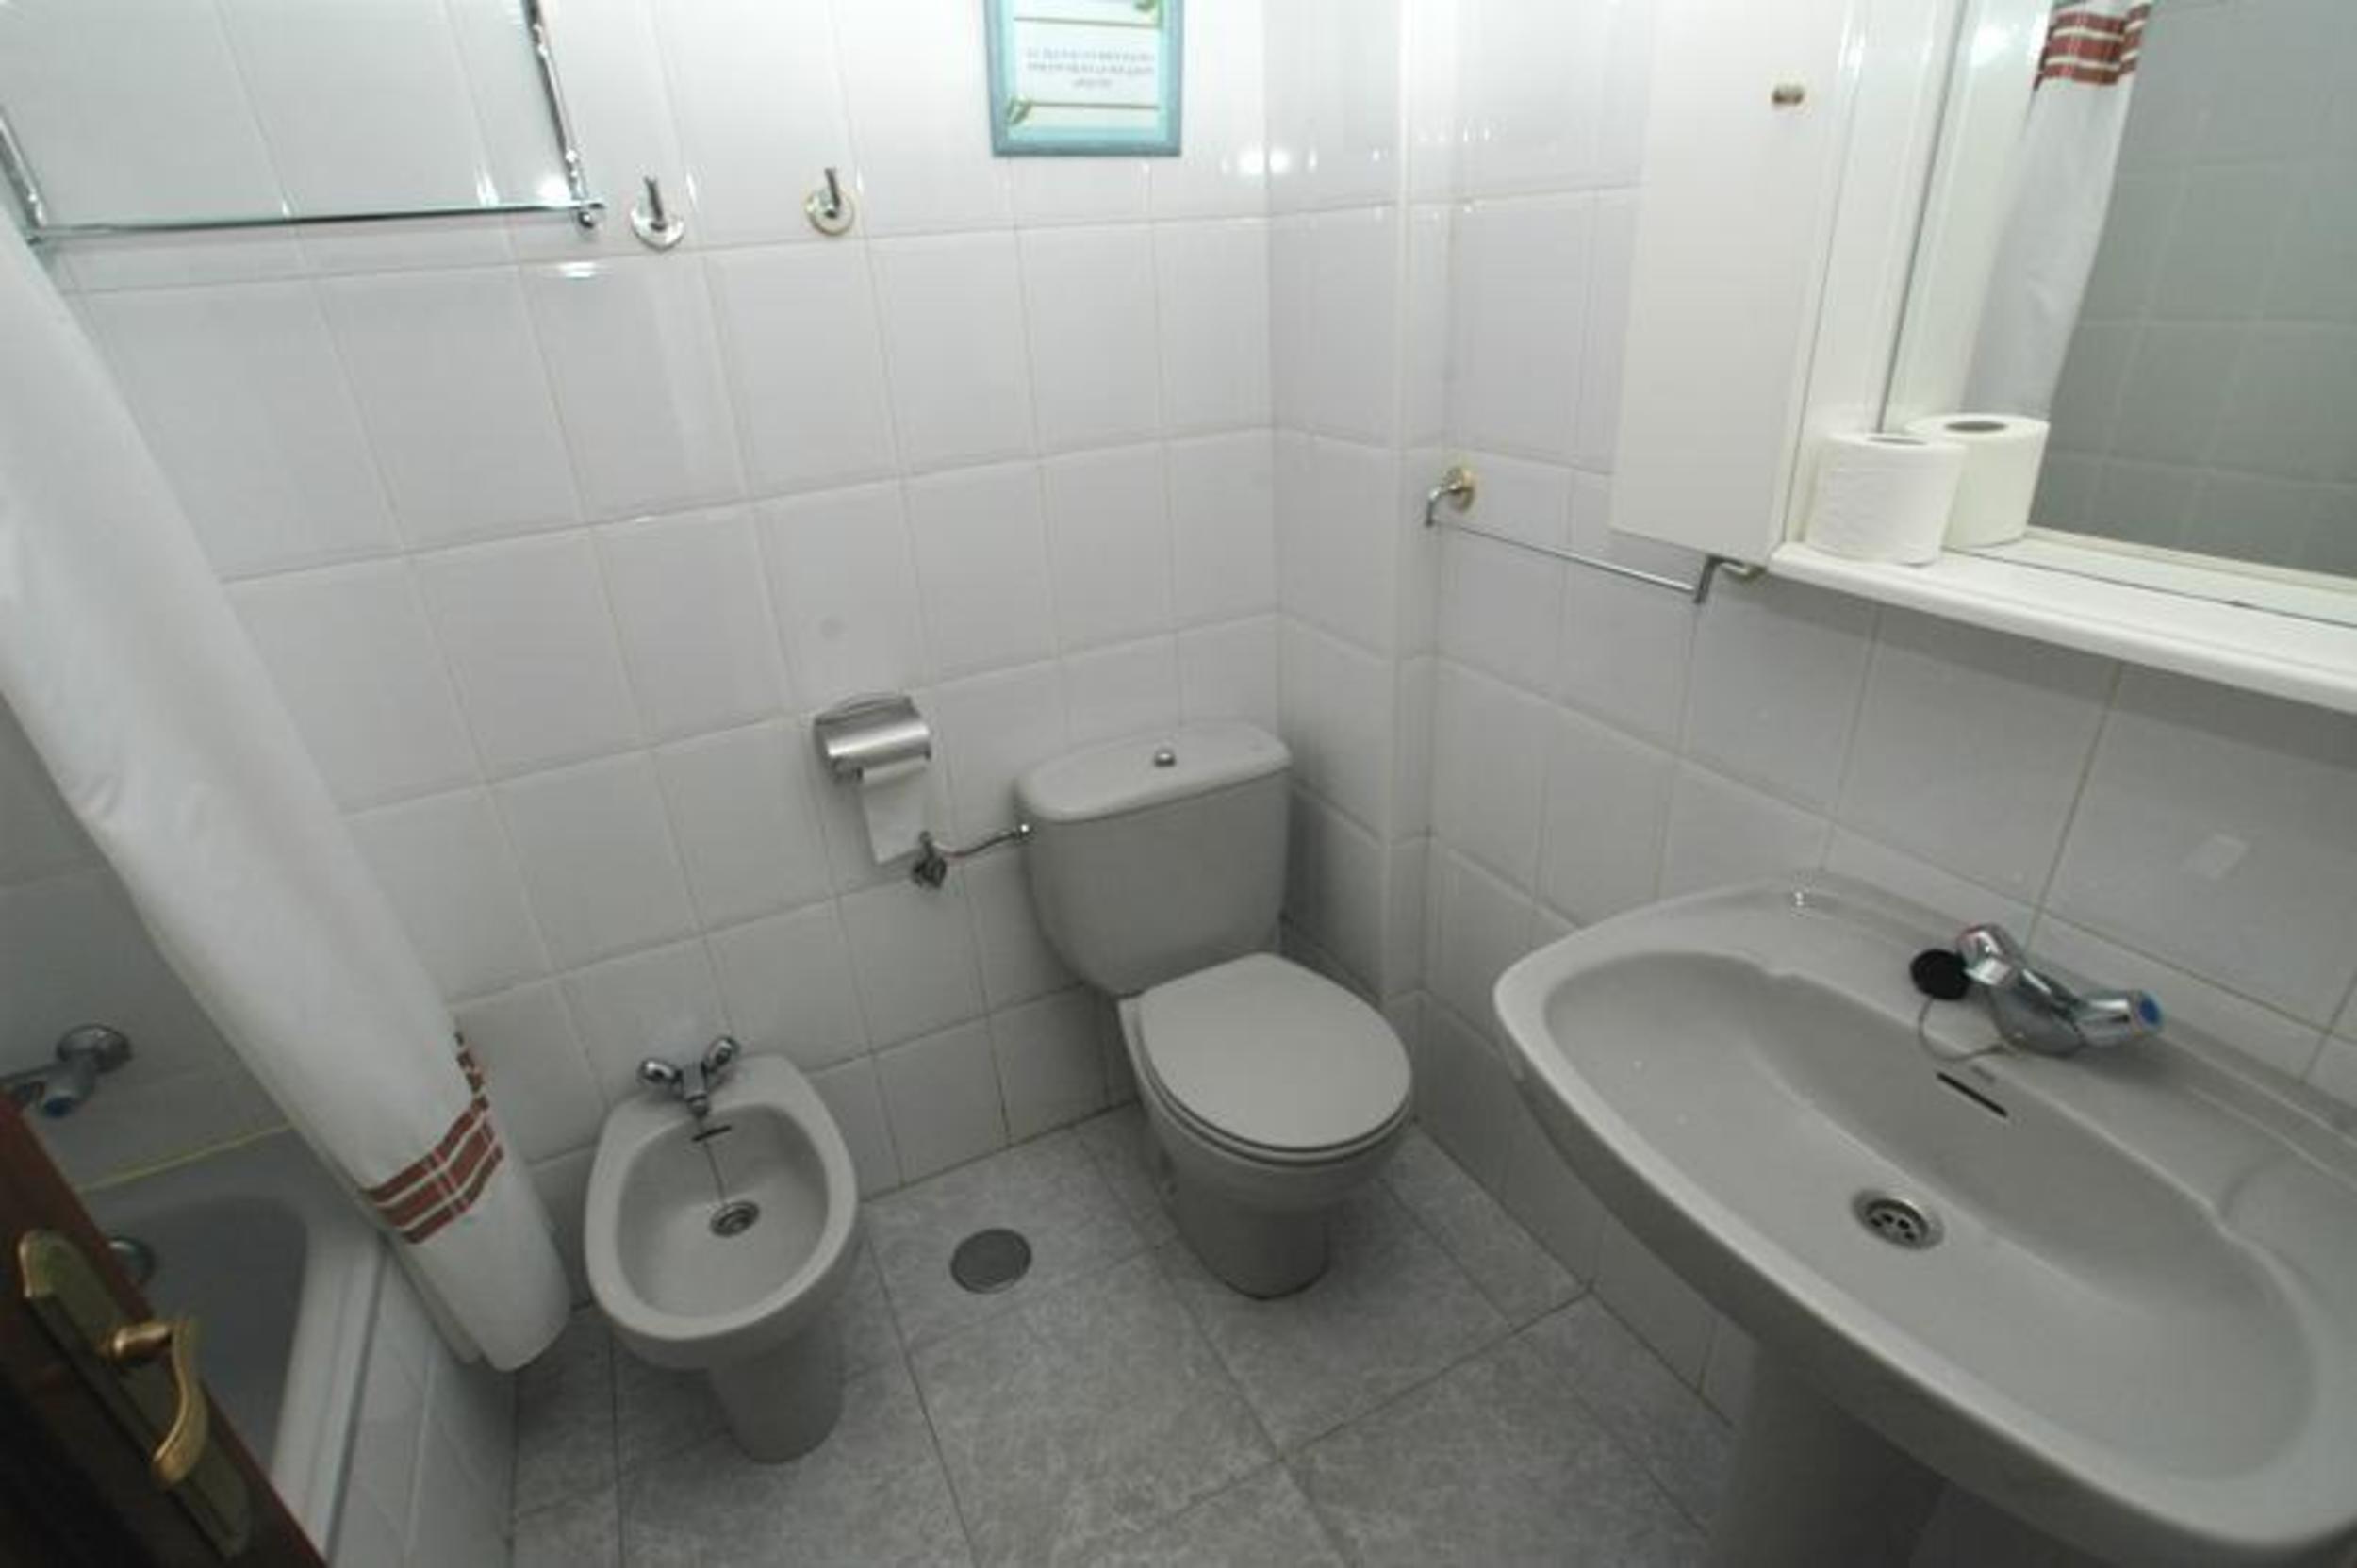 Ferienwohnung Apartment - 2 Bedrooms with Pool and Sea views - 102766 (2360874), Isla, Costa de Cantabria, Kantabrien, Spanien, Bild 10